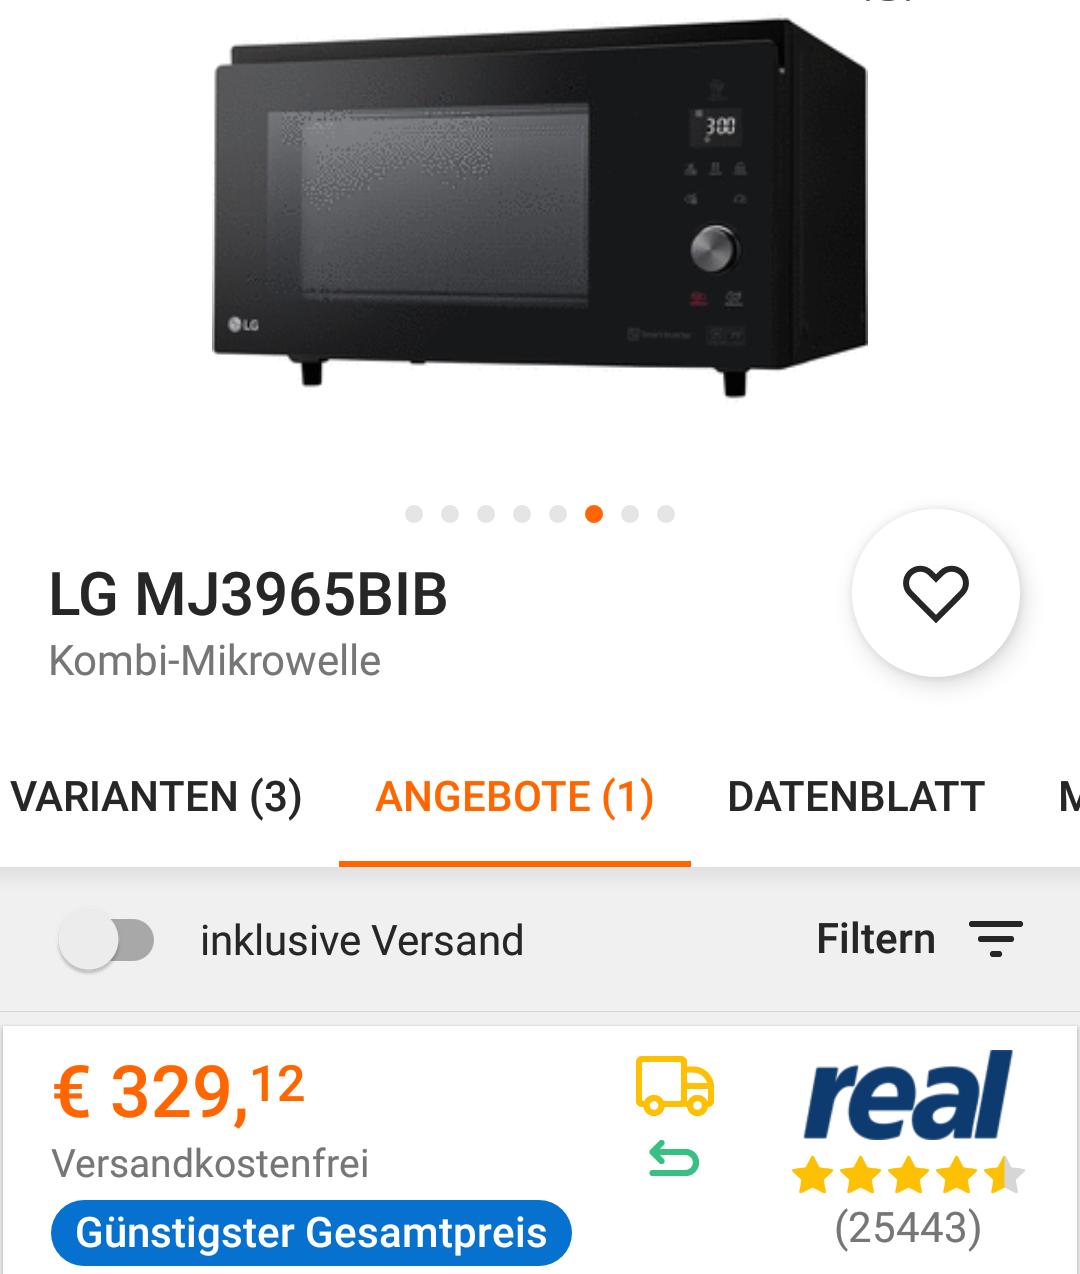 LG Kombi Mikrowelle MJ3965BIB bei IBOOD -50%